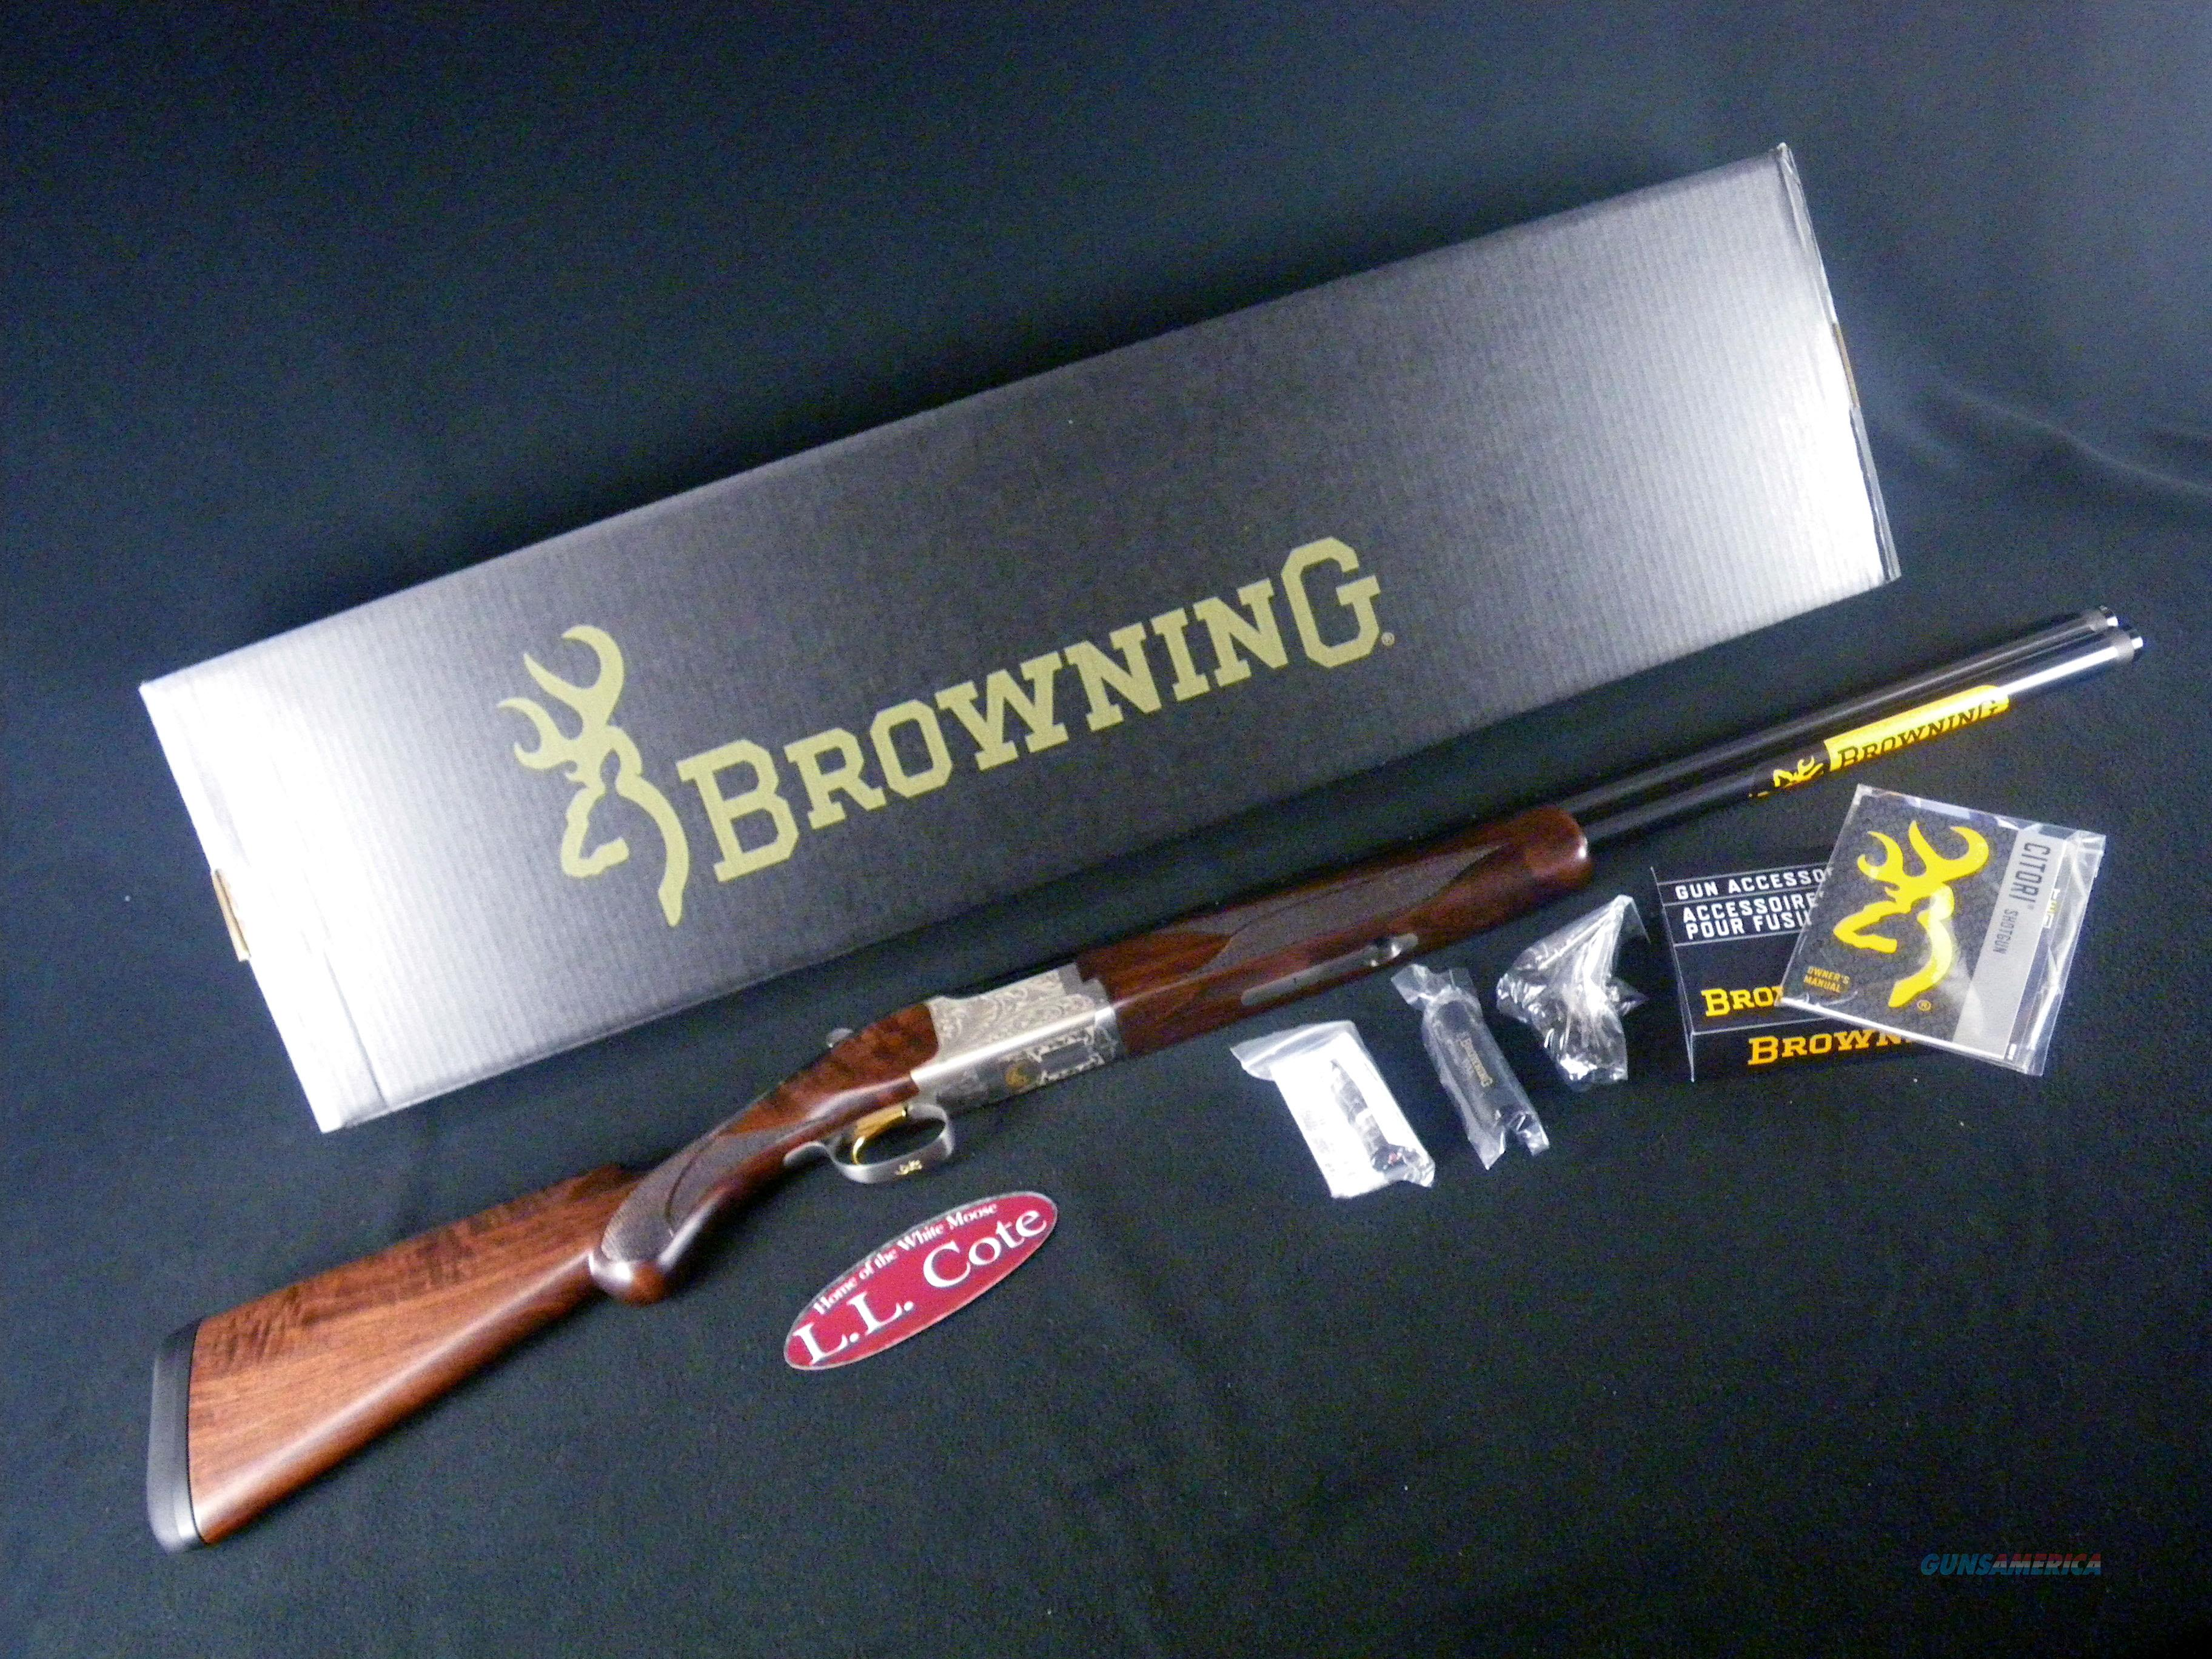 "Browning Citori Feather Lightning 12ga 28"" NEW 3"" 018163305  Guns > Shotguns > Browning Shotguns > Over Unders > Citori > Hunting"